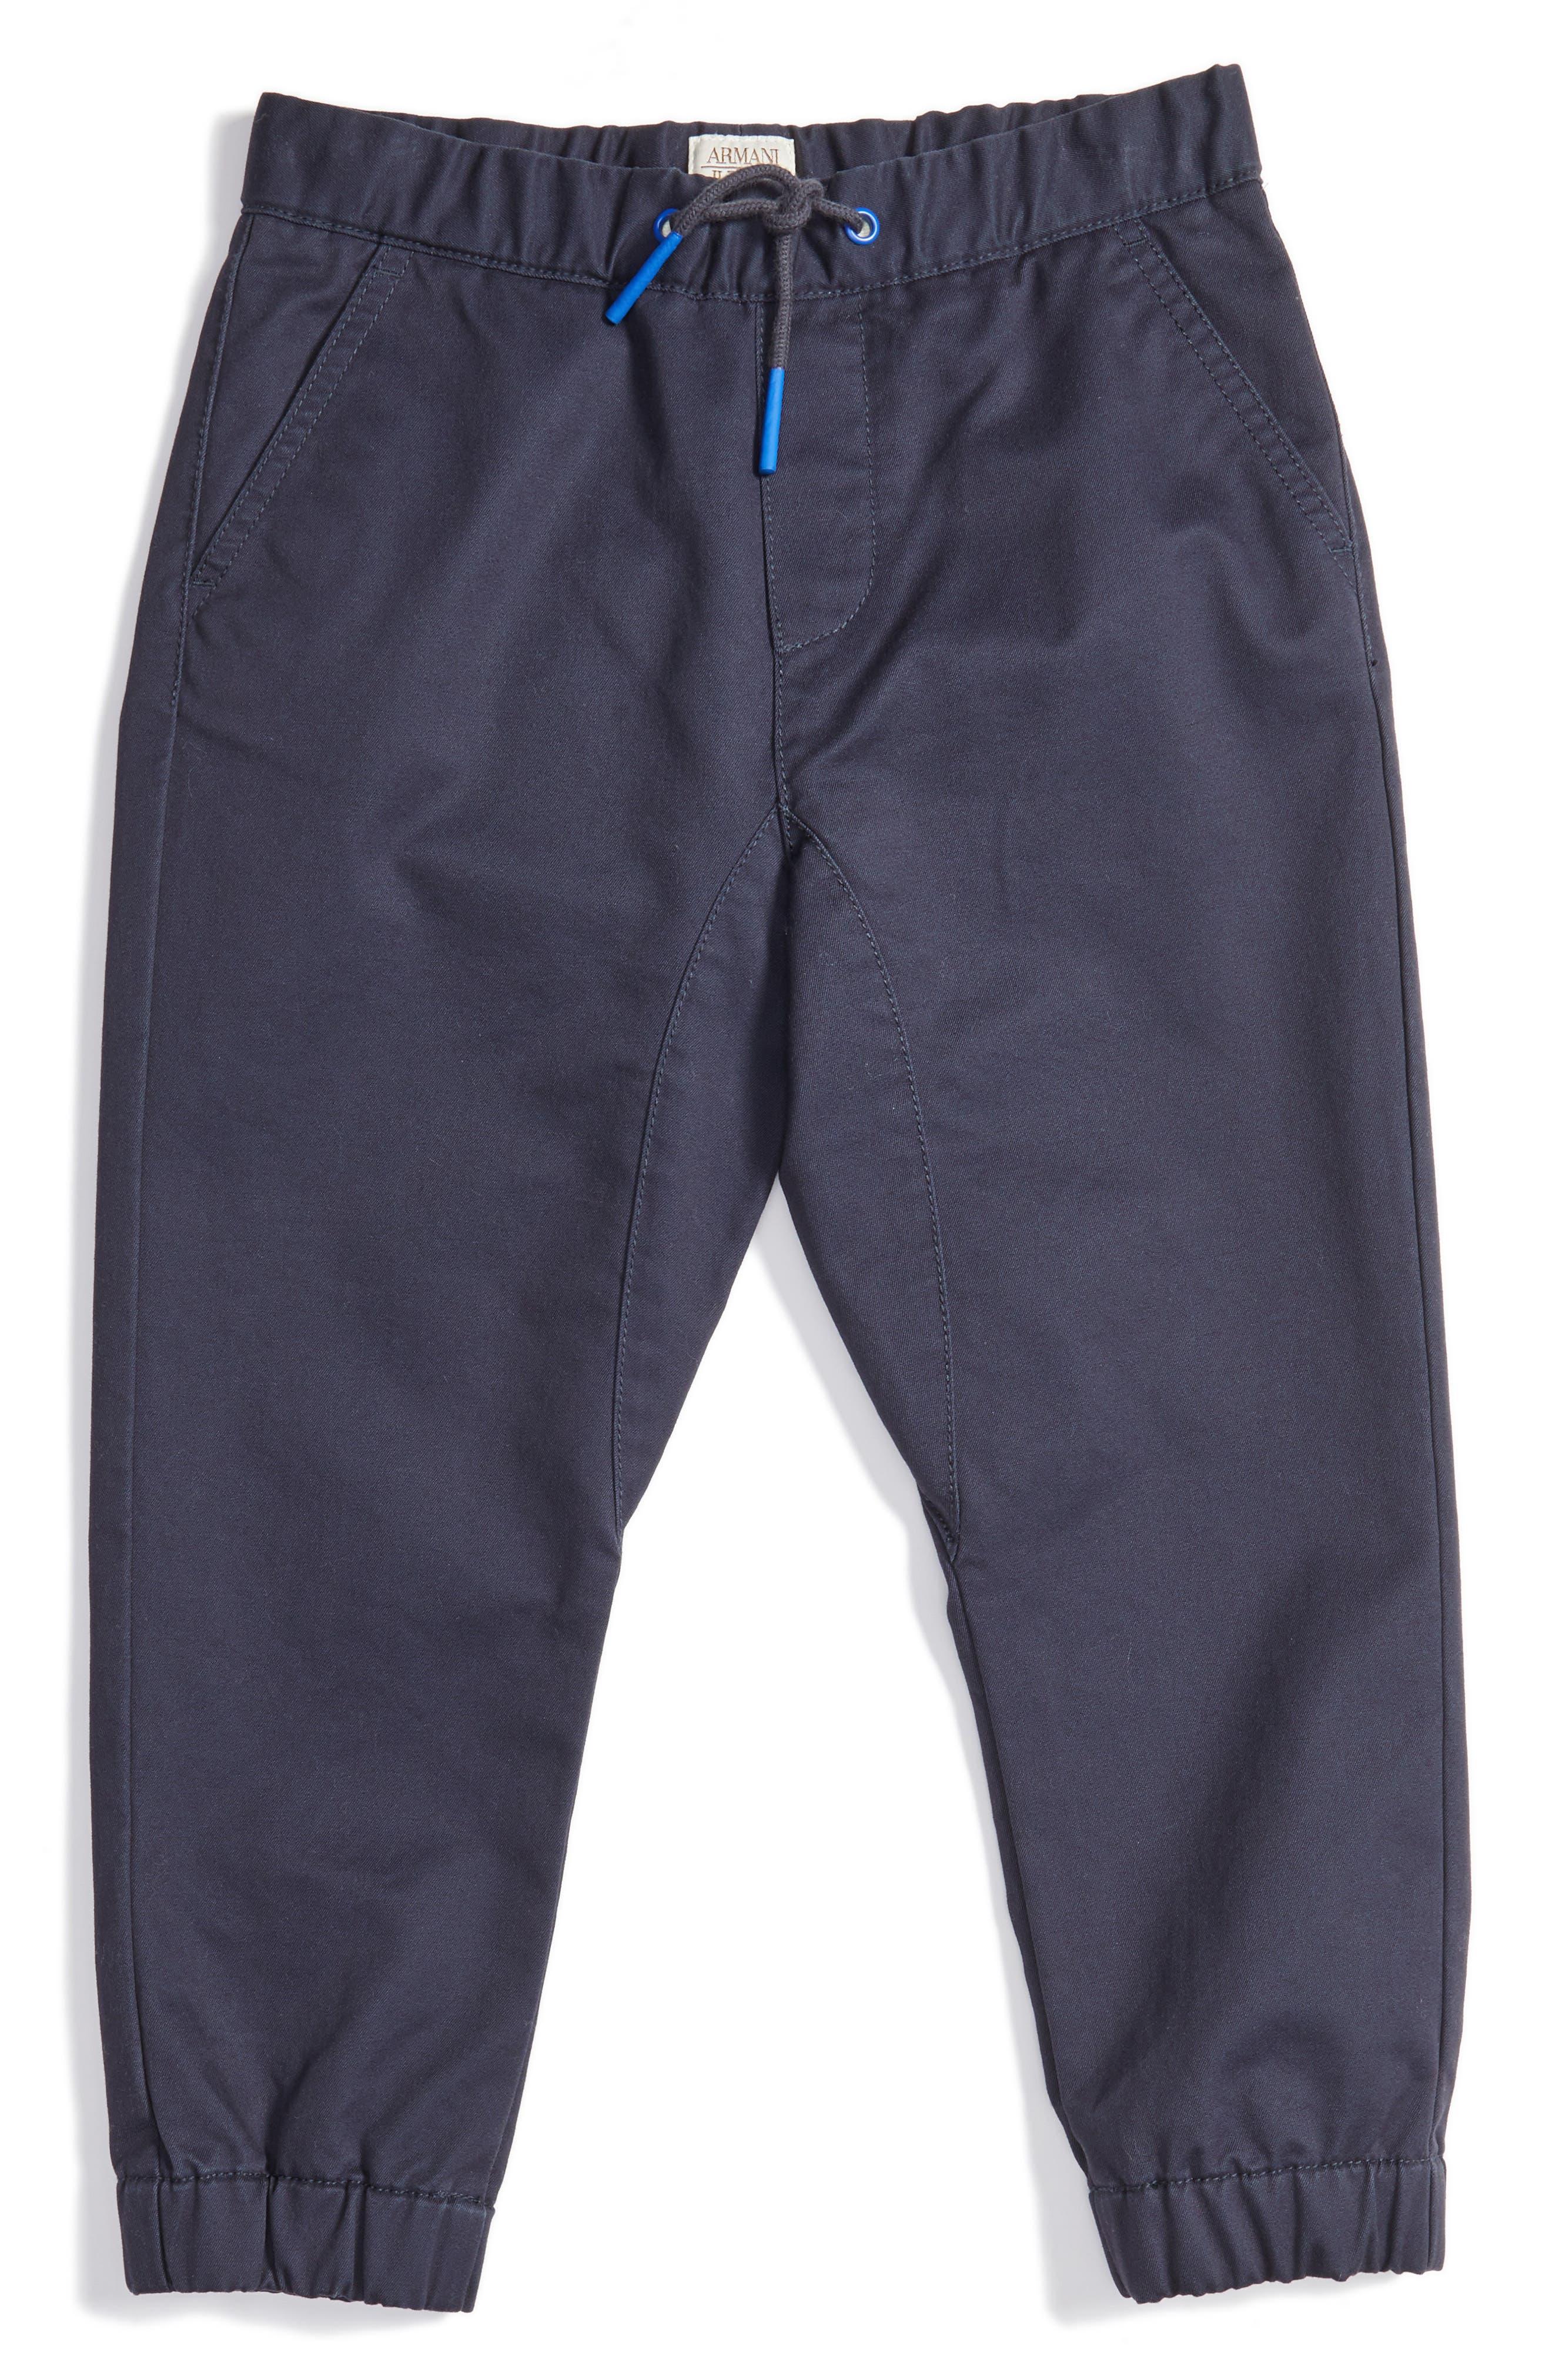 ARMANI JUNIOR Cotton Twill Jogger Pants